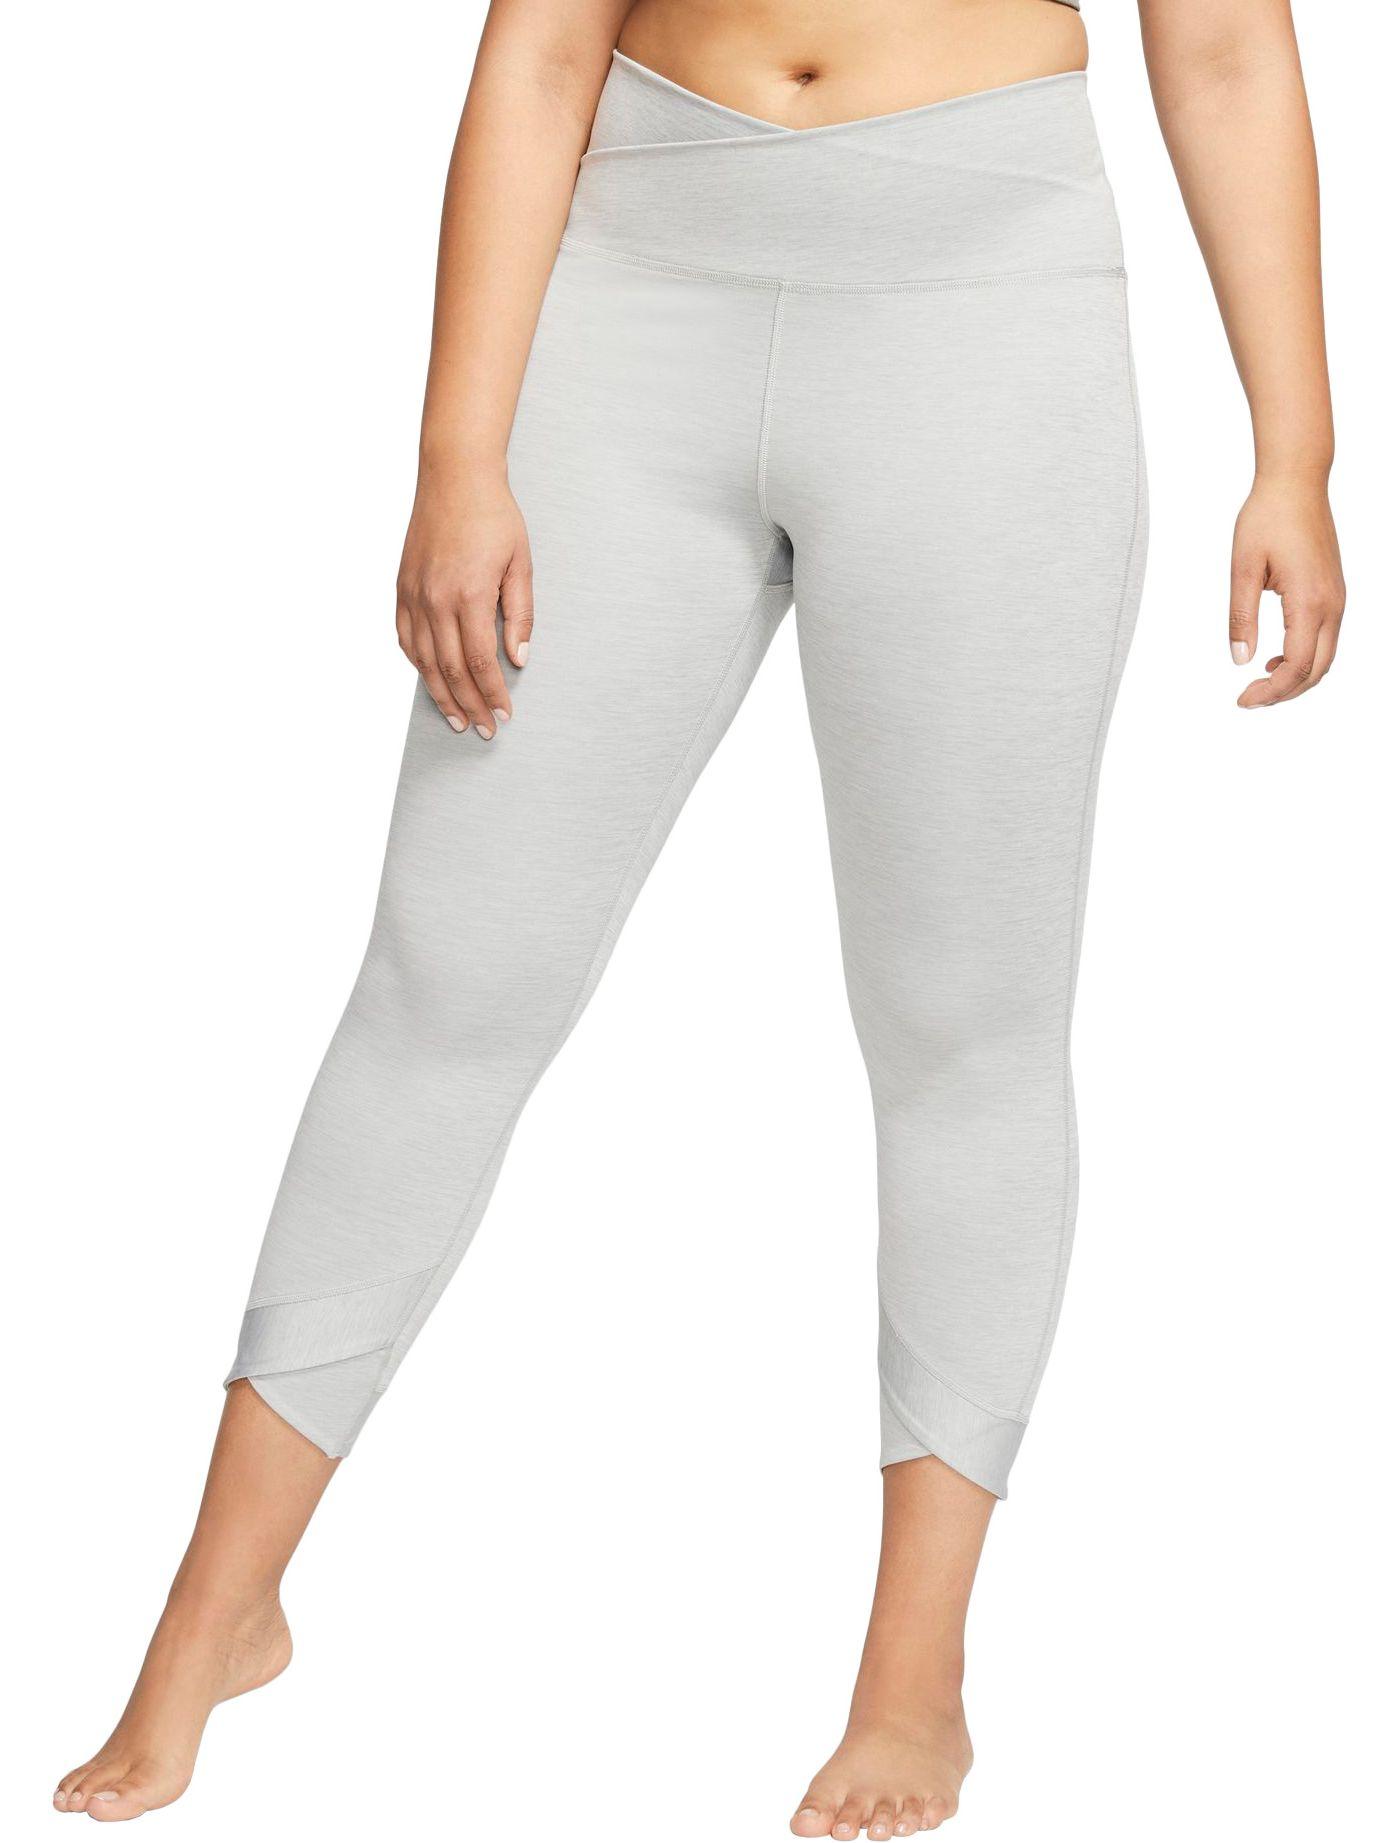 Nike Women's Plus Size Yoga Wrap 7/8 Tights